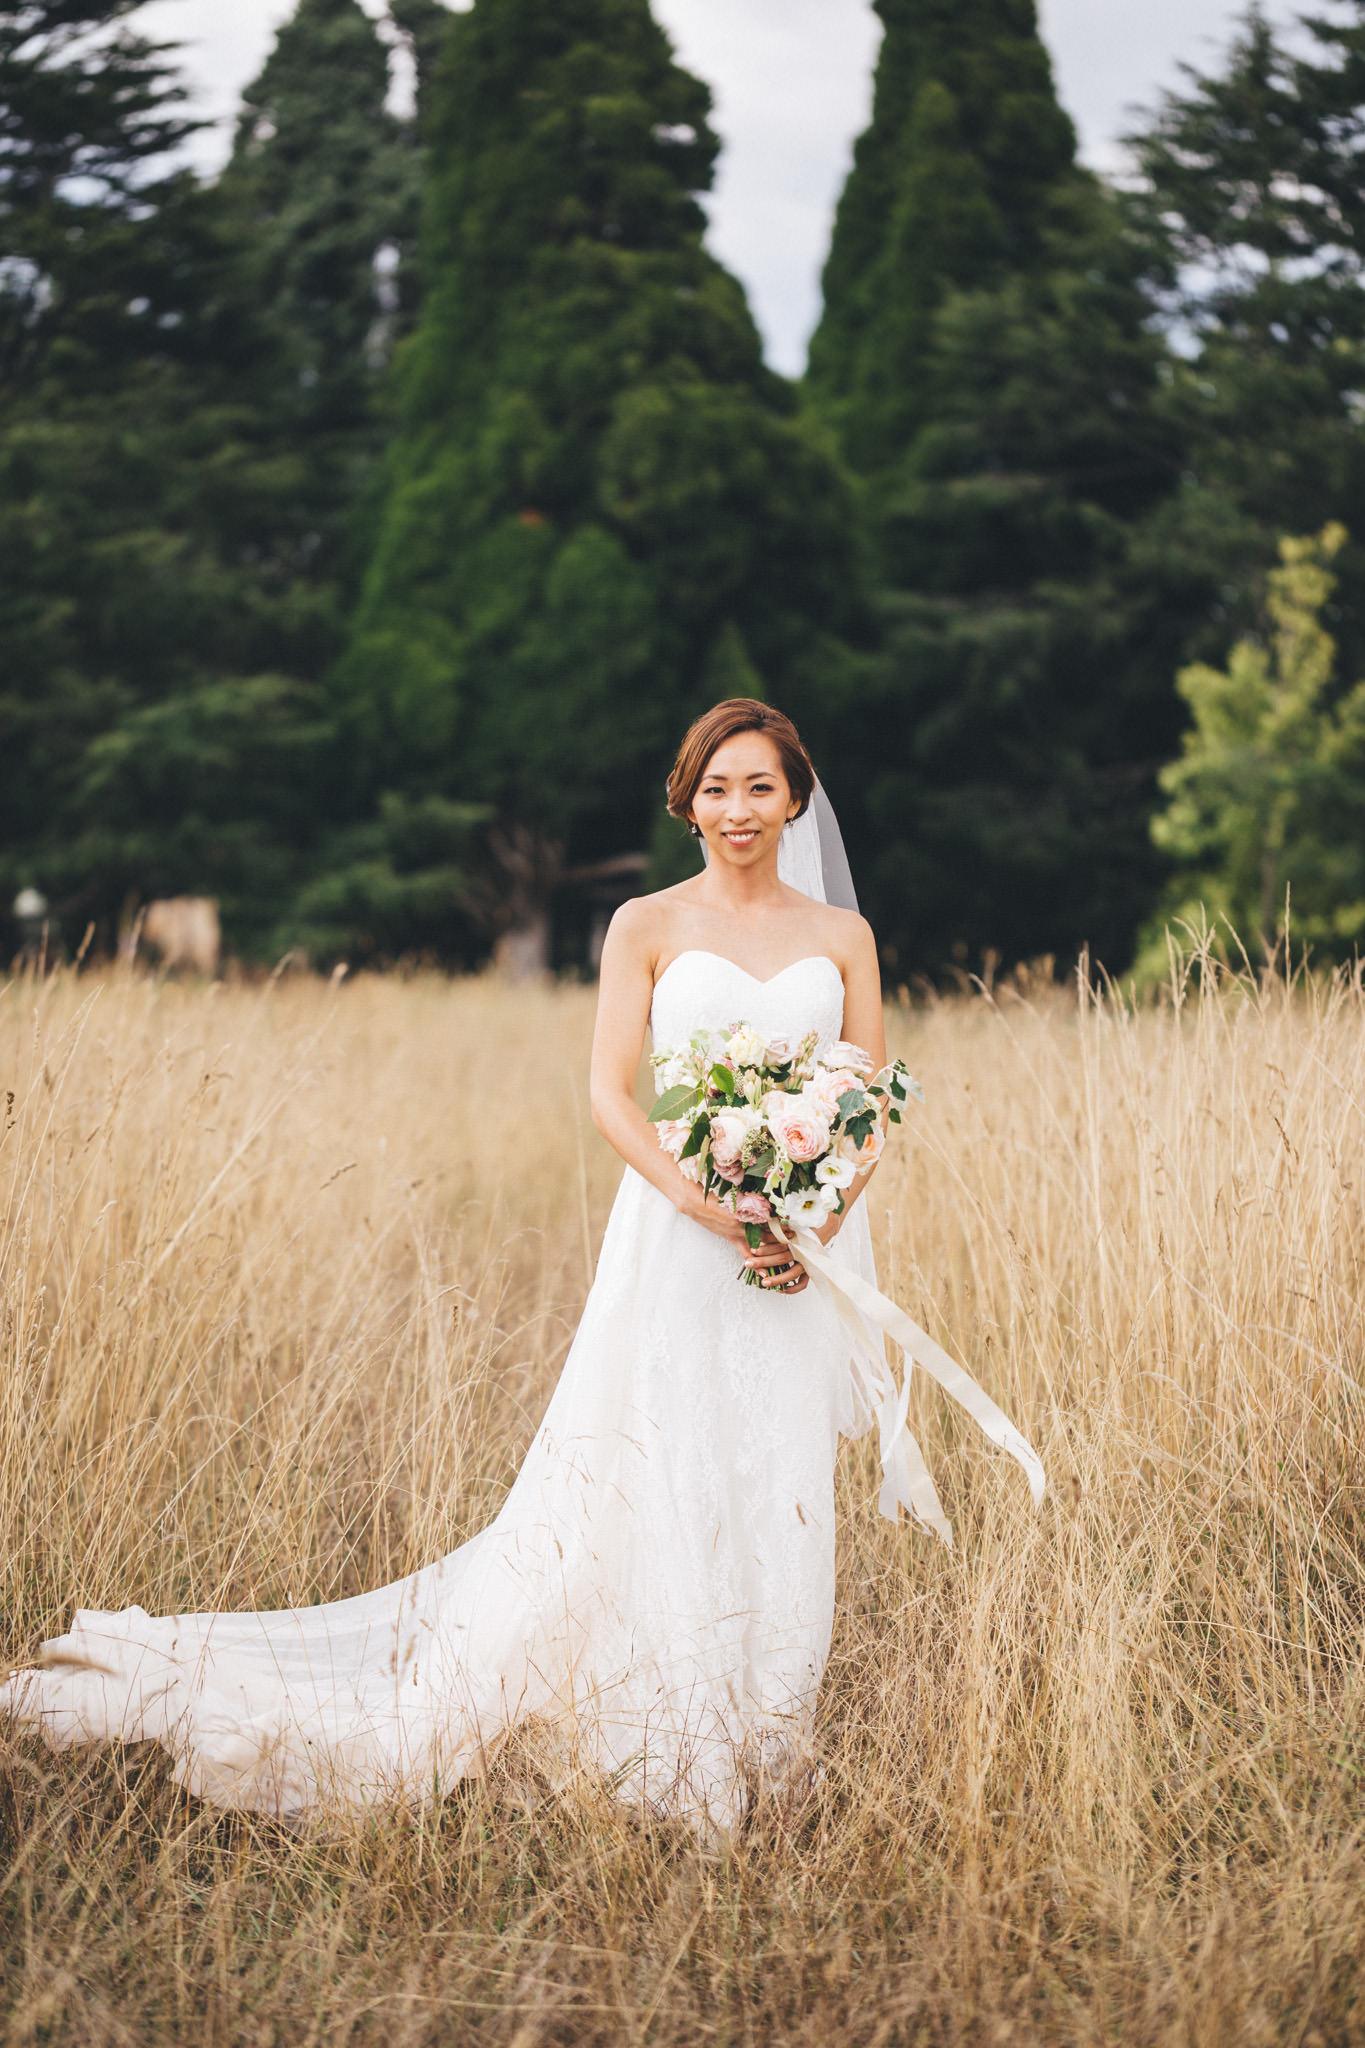 Ann-Marie-Yuen-Photography-0127.jpg